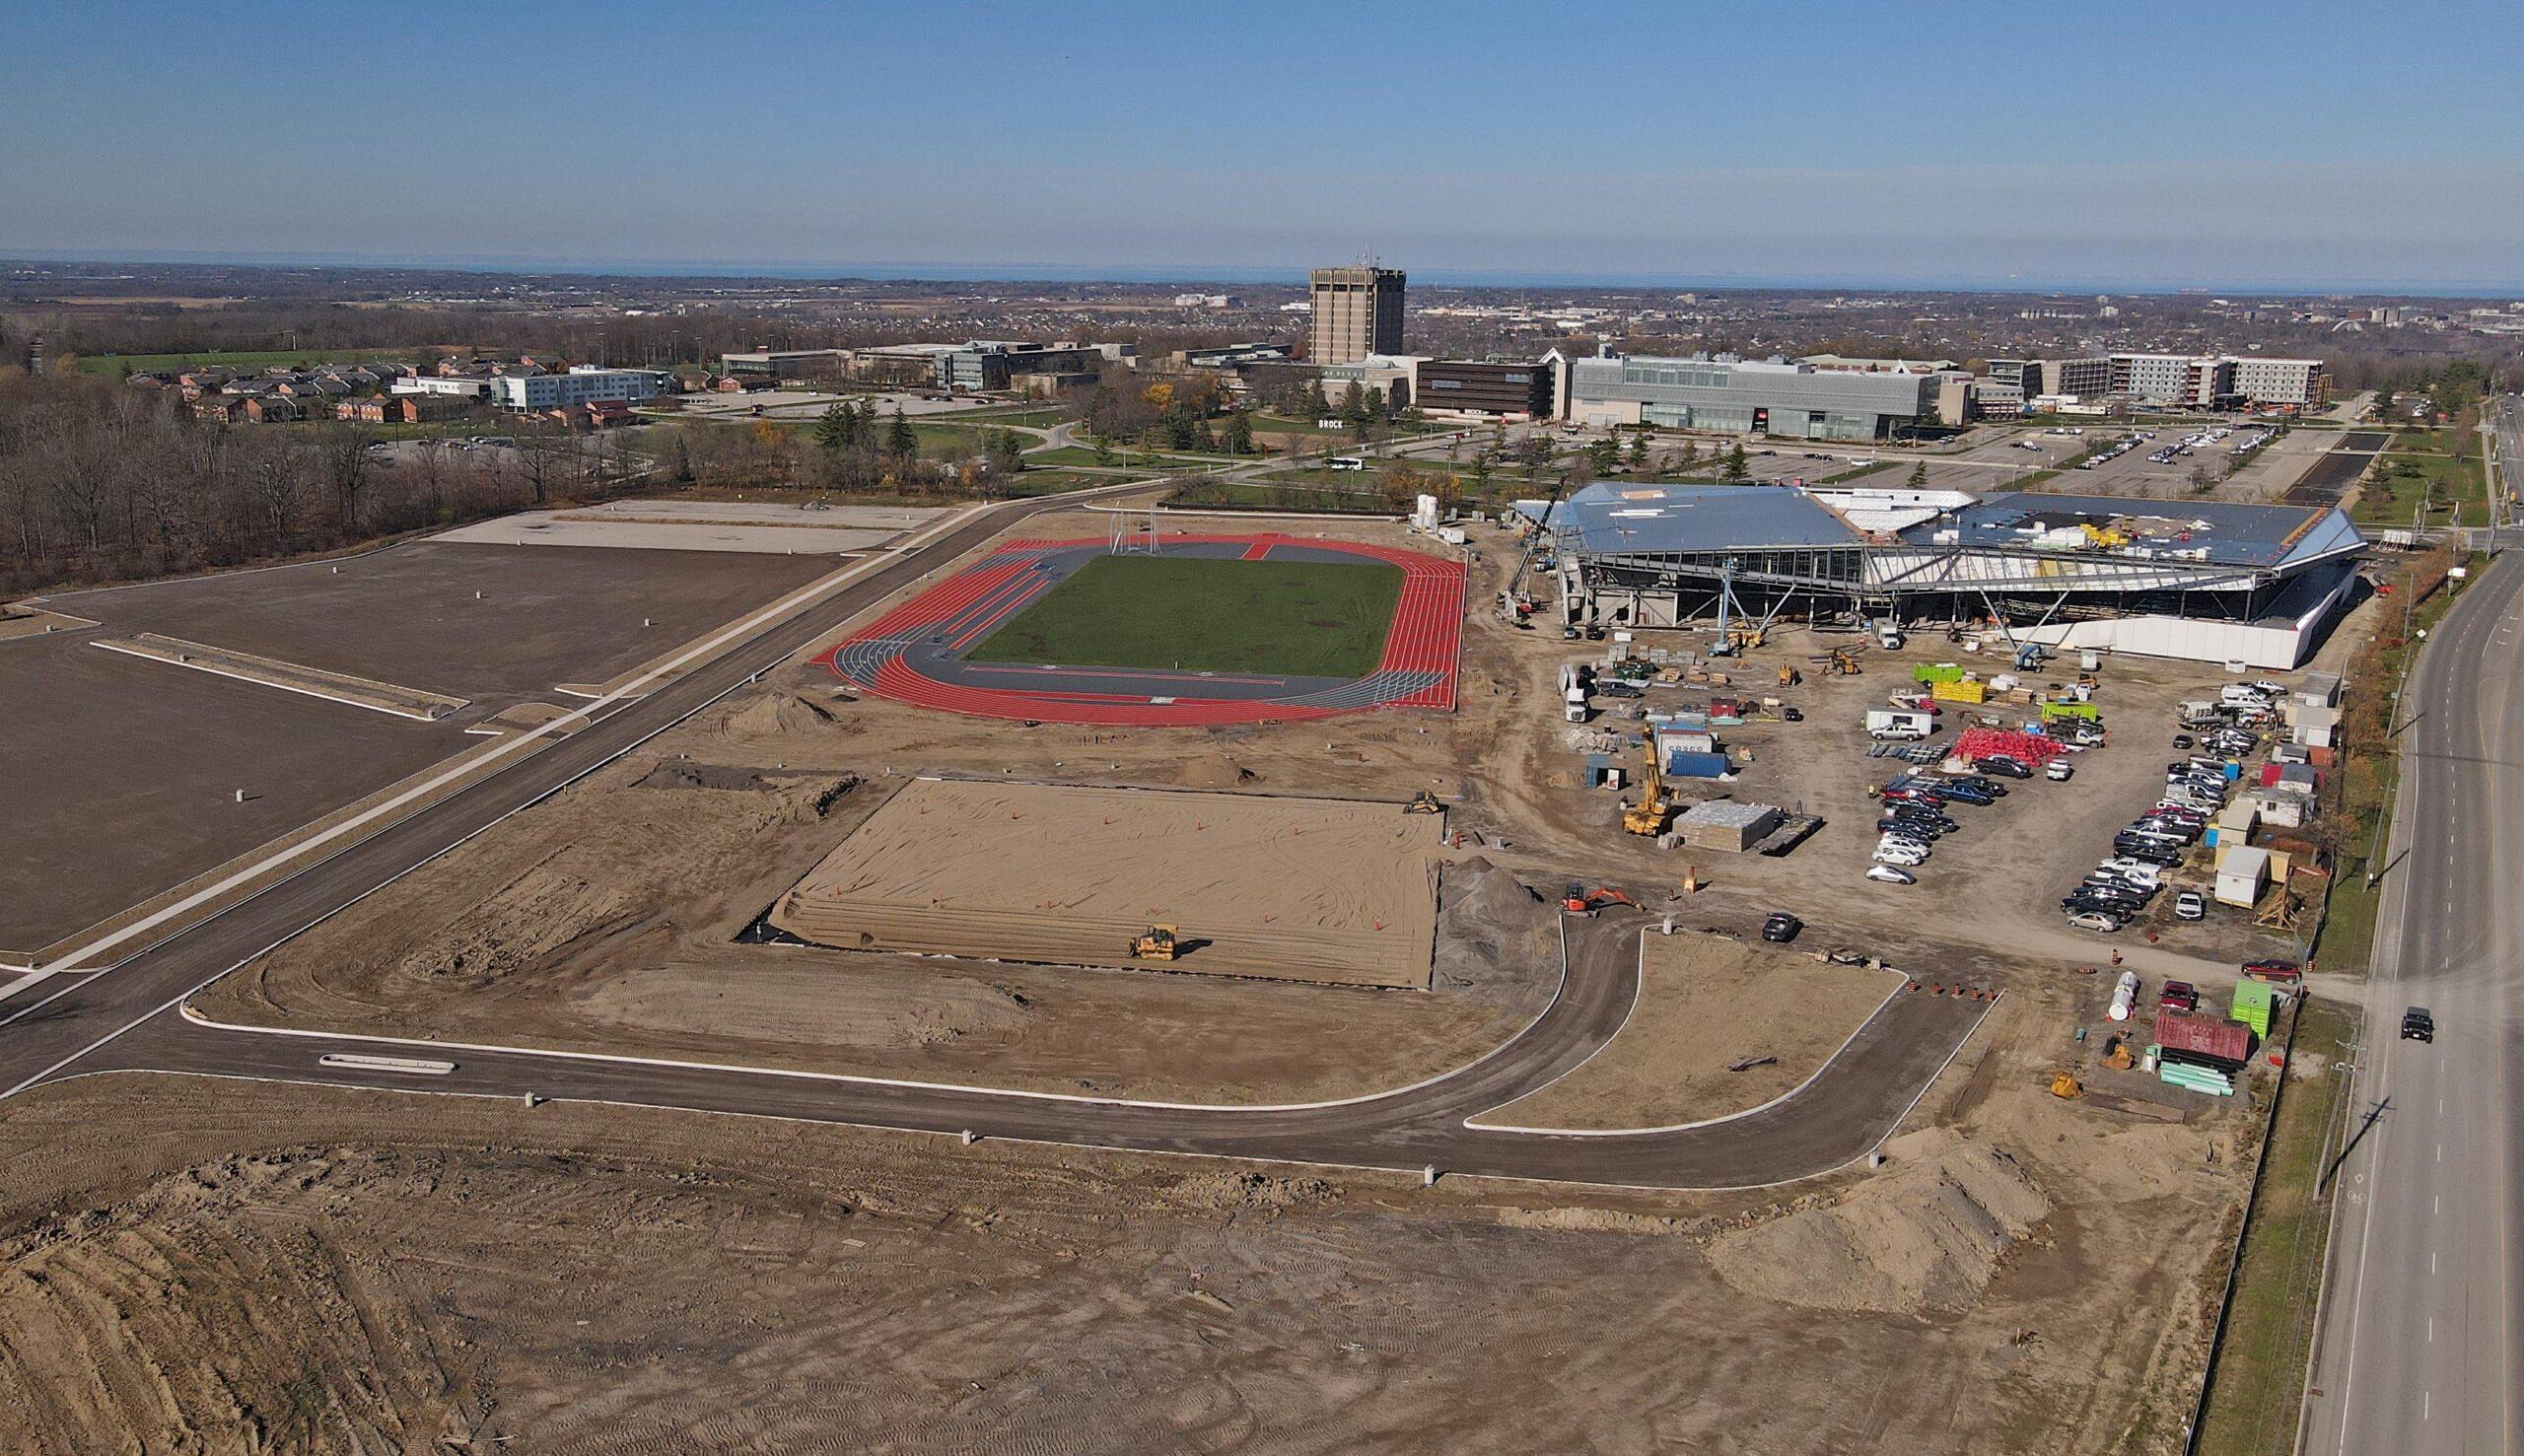 Brock U Canada ames facility development site.